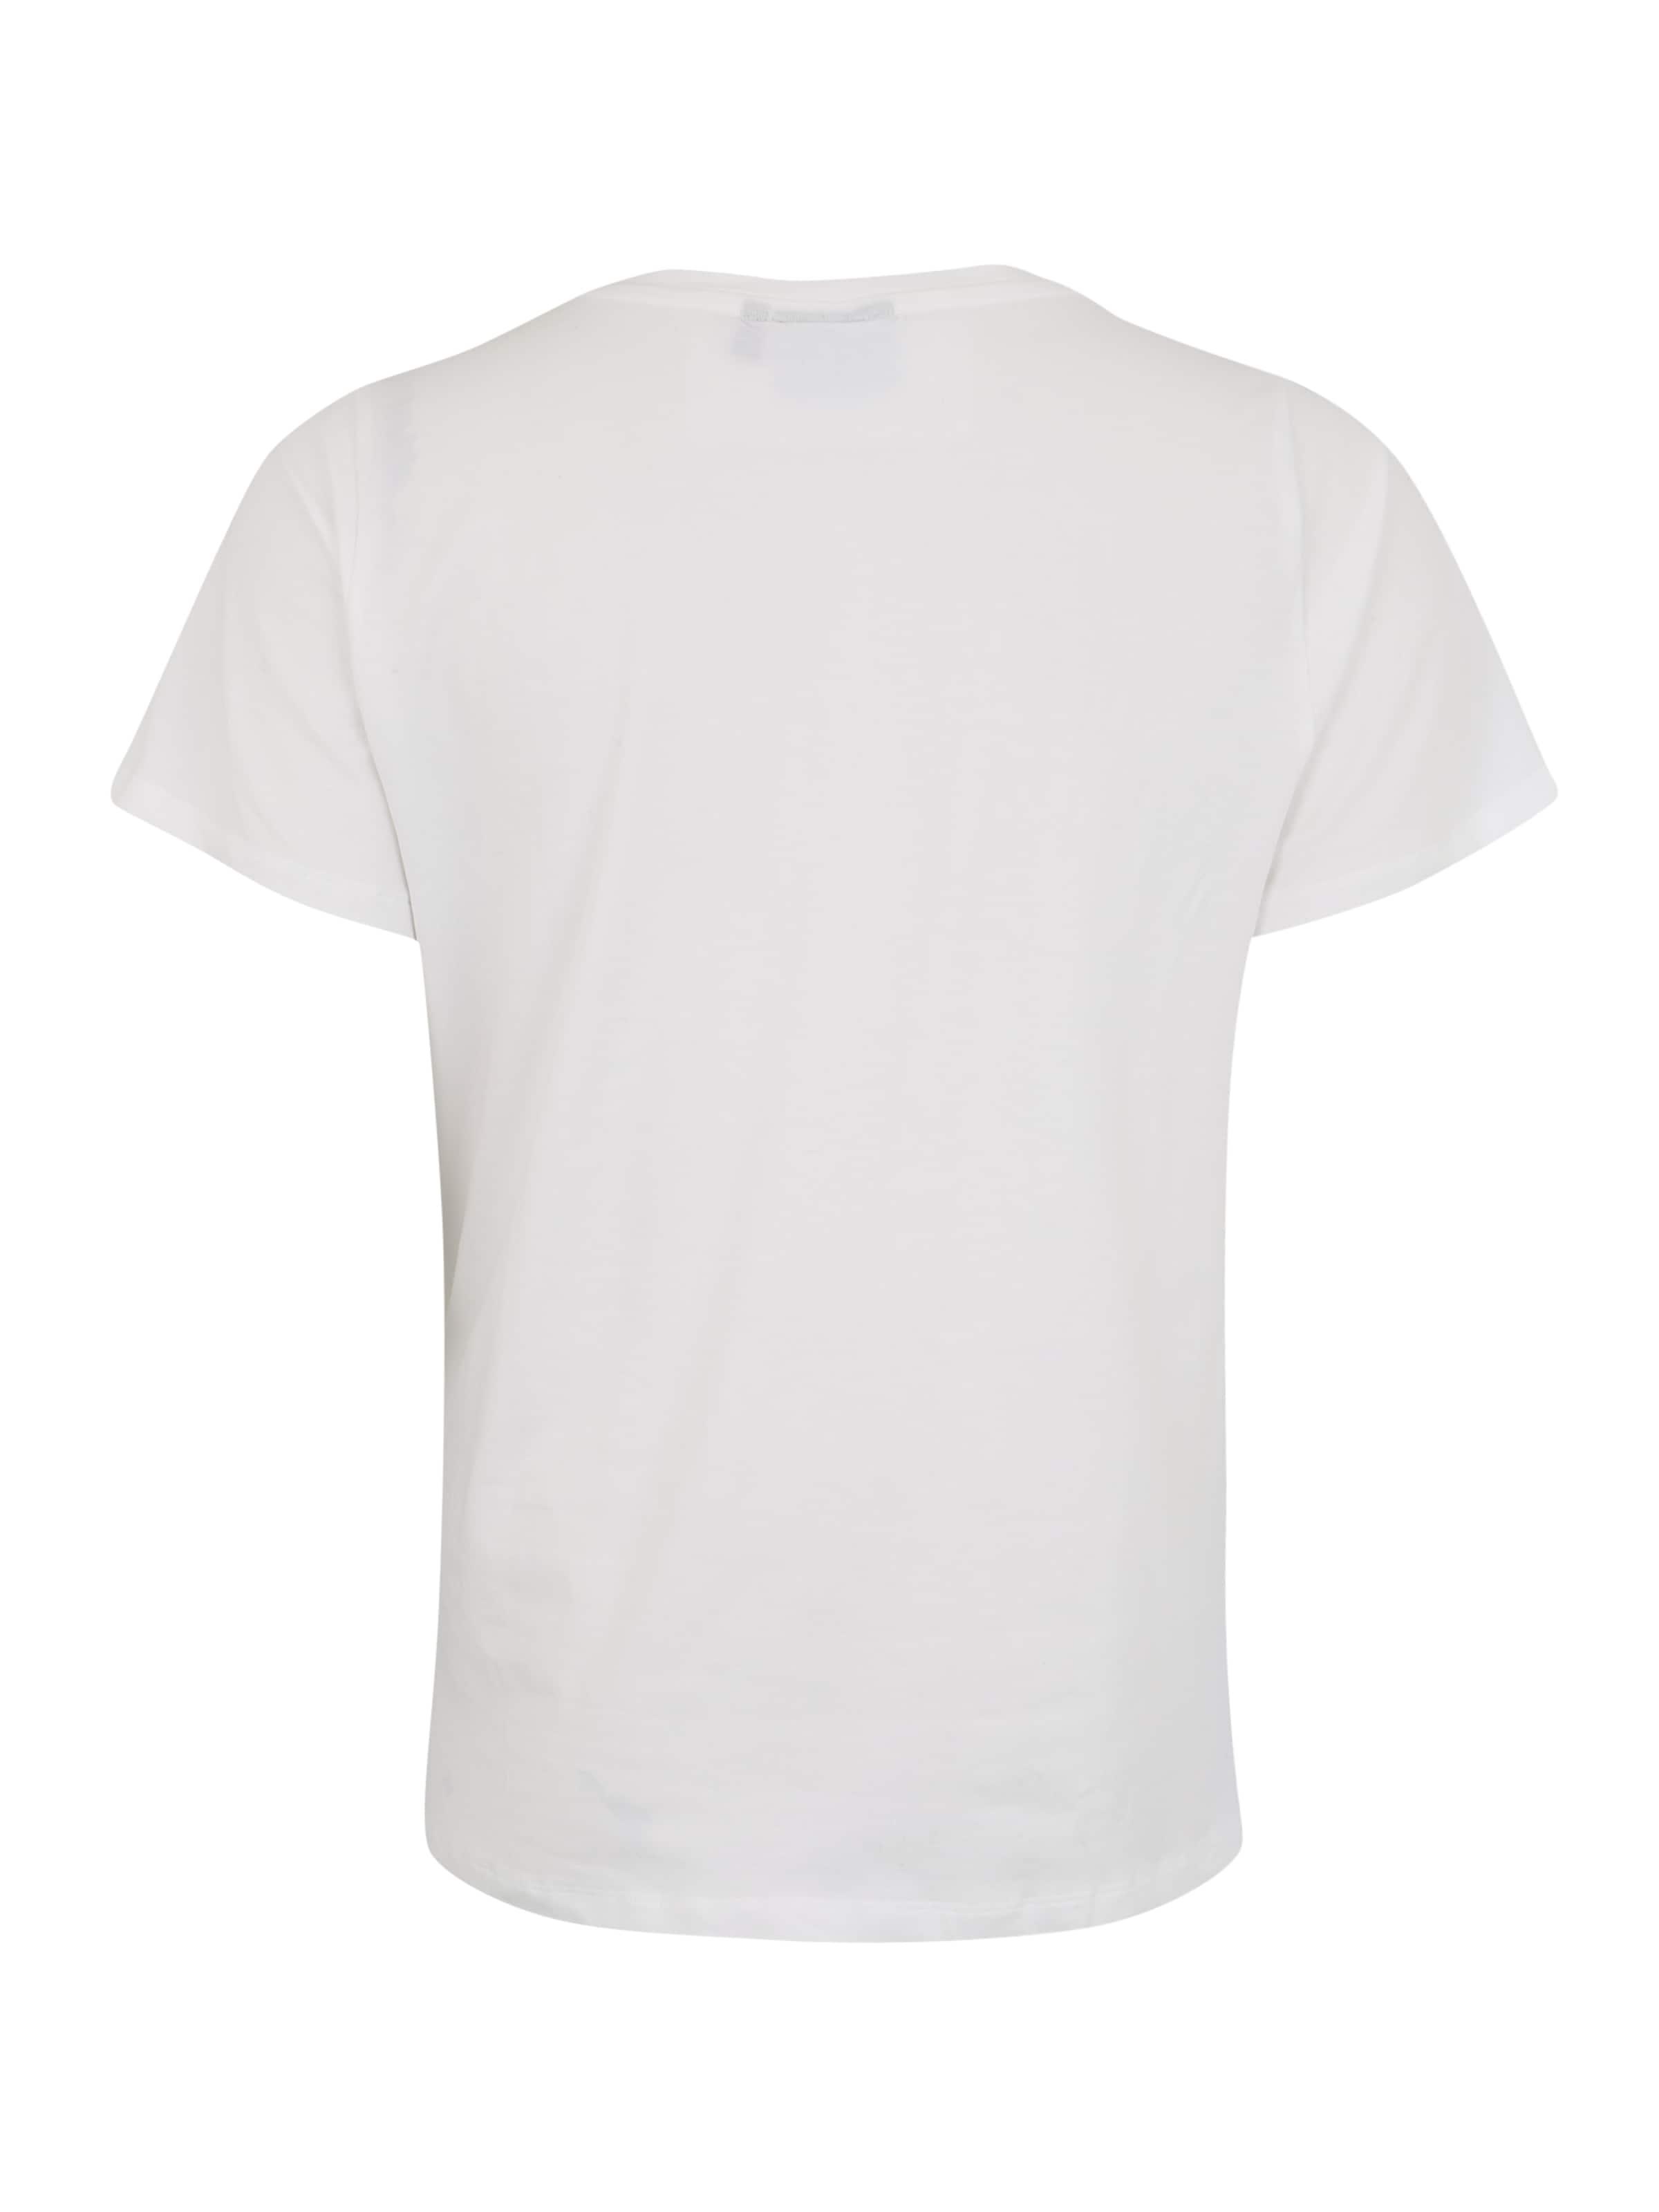 T En Noir shirt shirt Noir Zizzi En shirt En Zizzi Zizzi T T JK3Tl1Fc